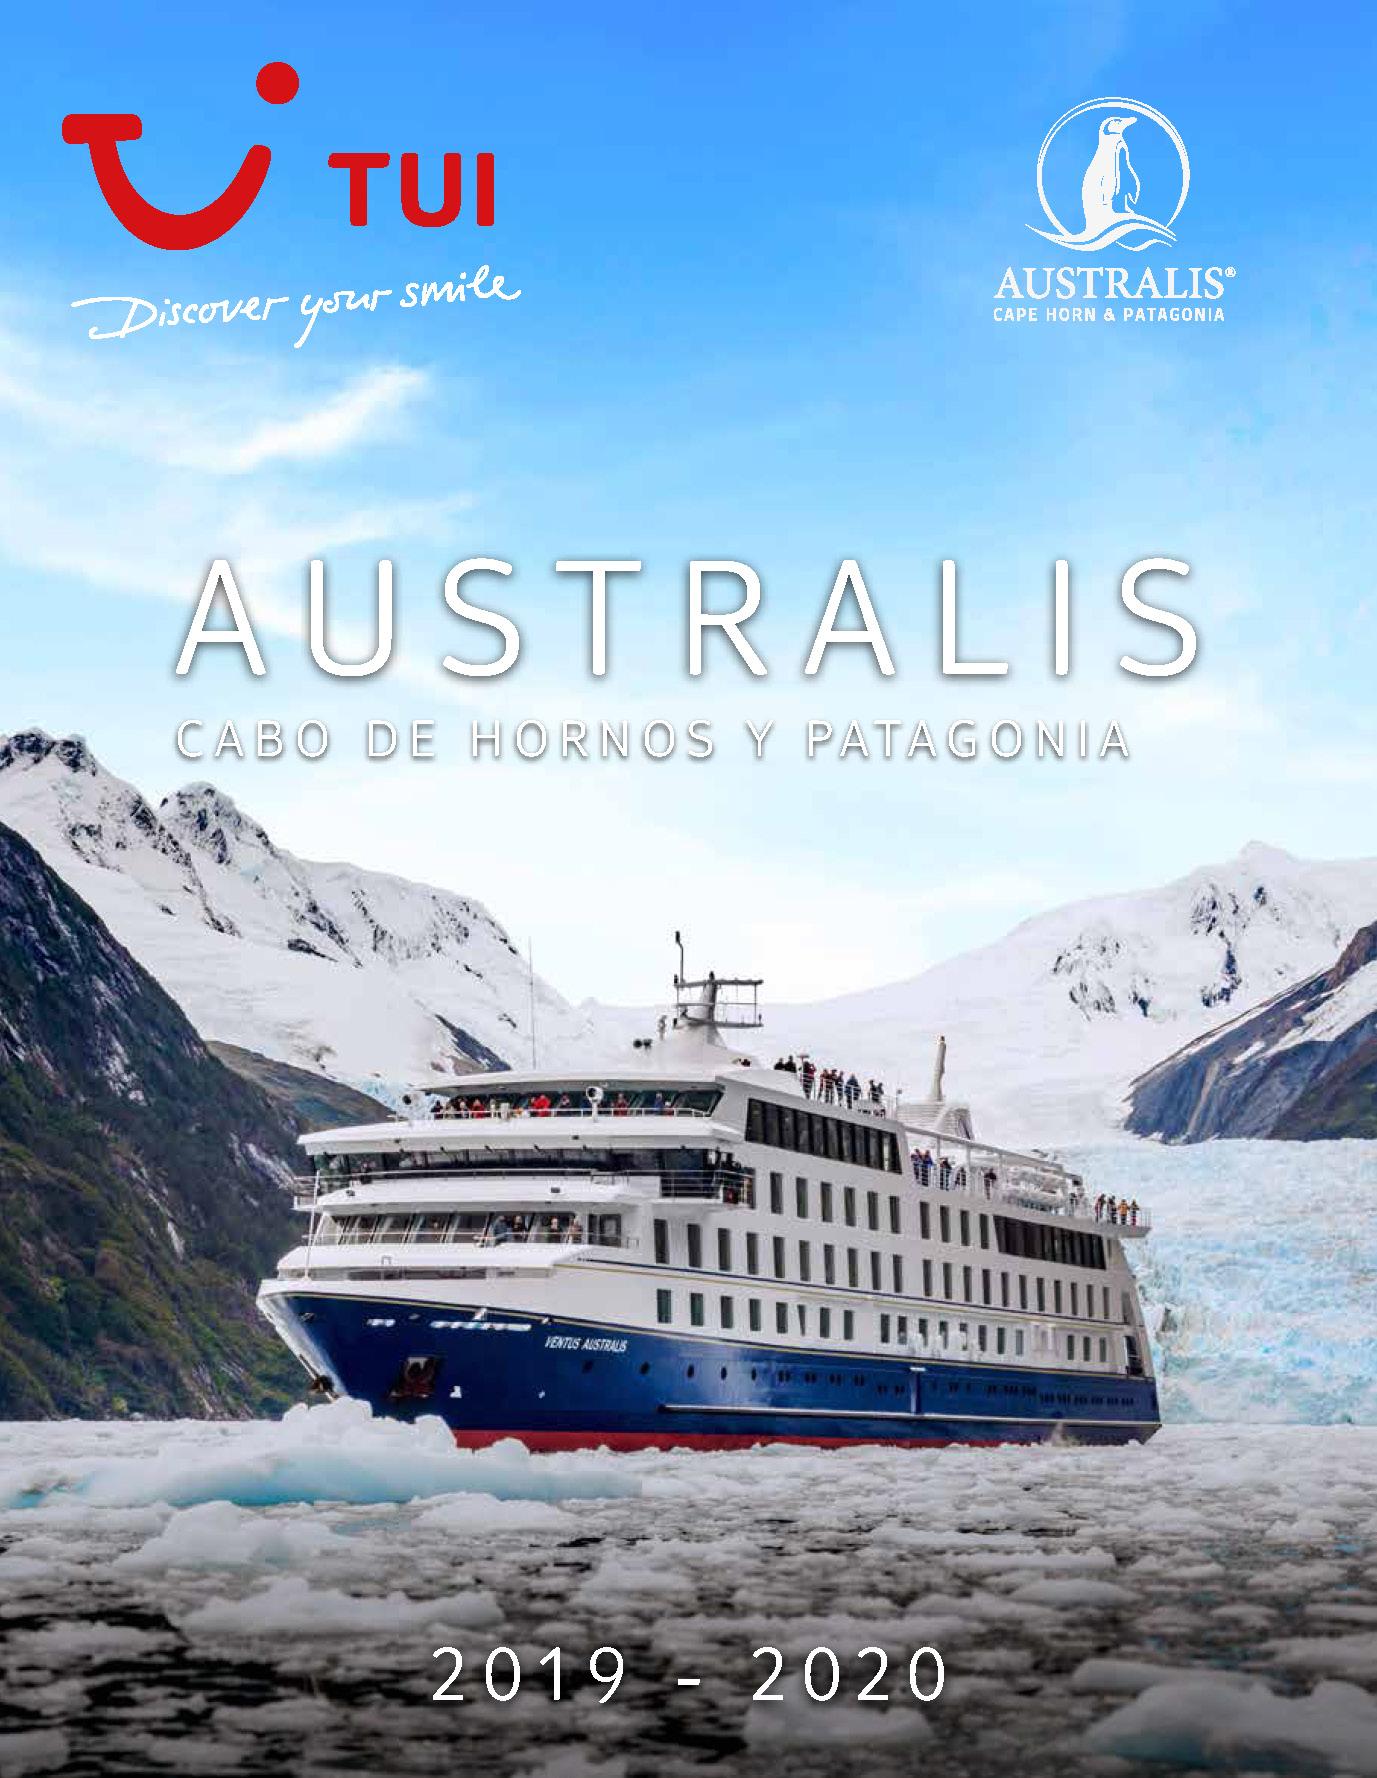 Catalogo TUI Ambassador Tours Cruceros Australis 2019-2020